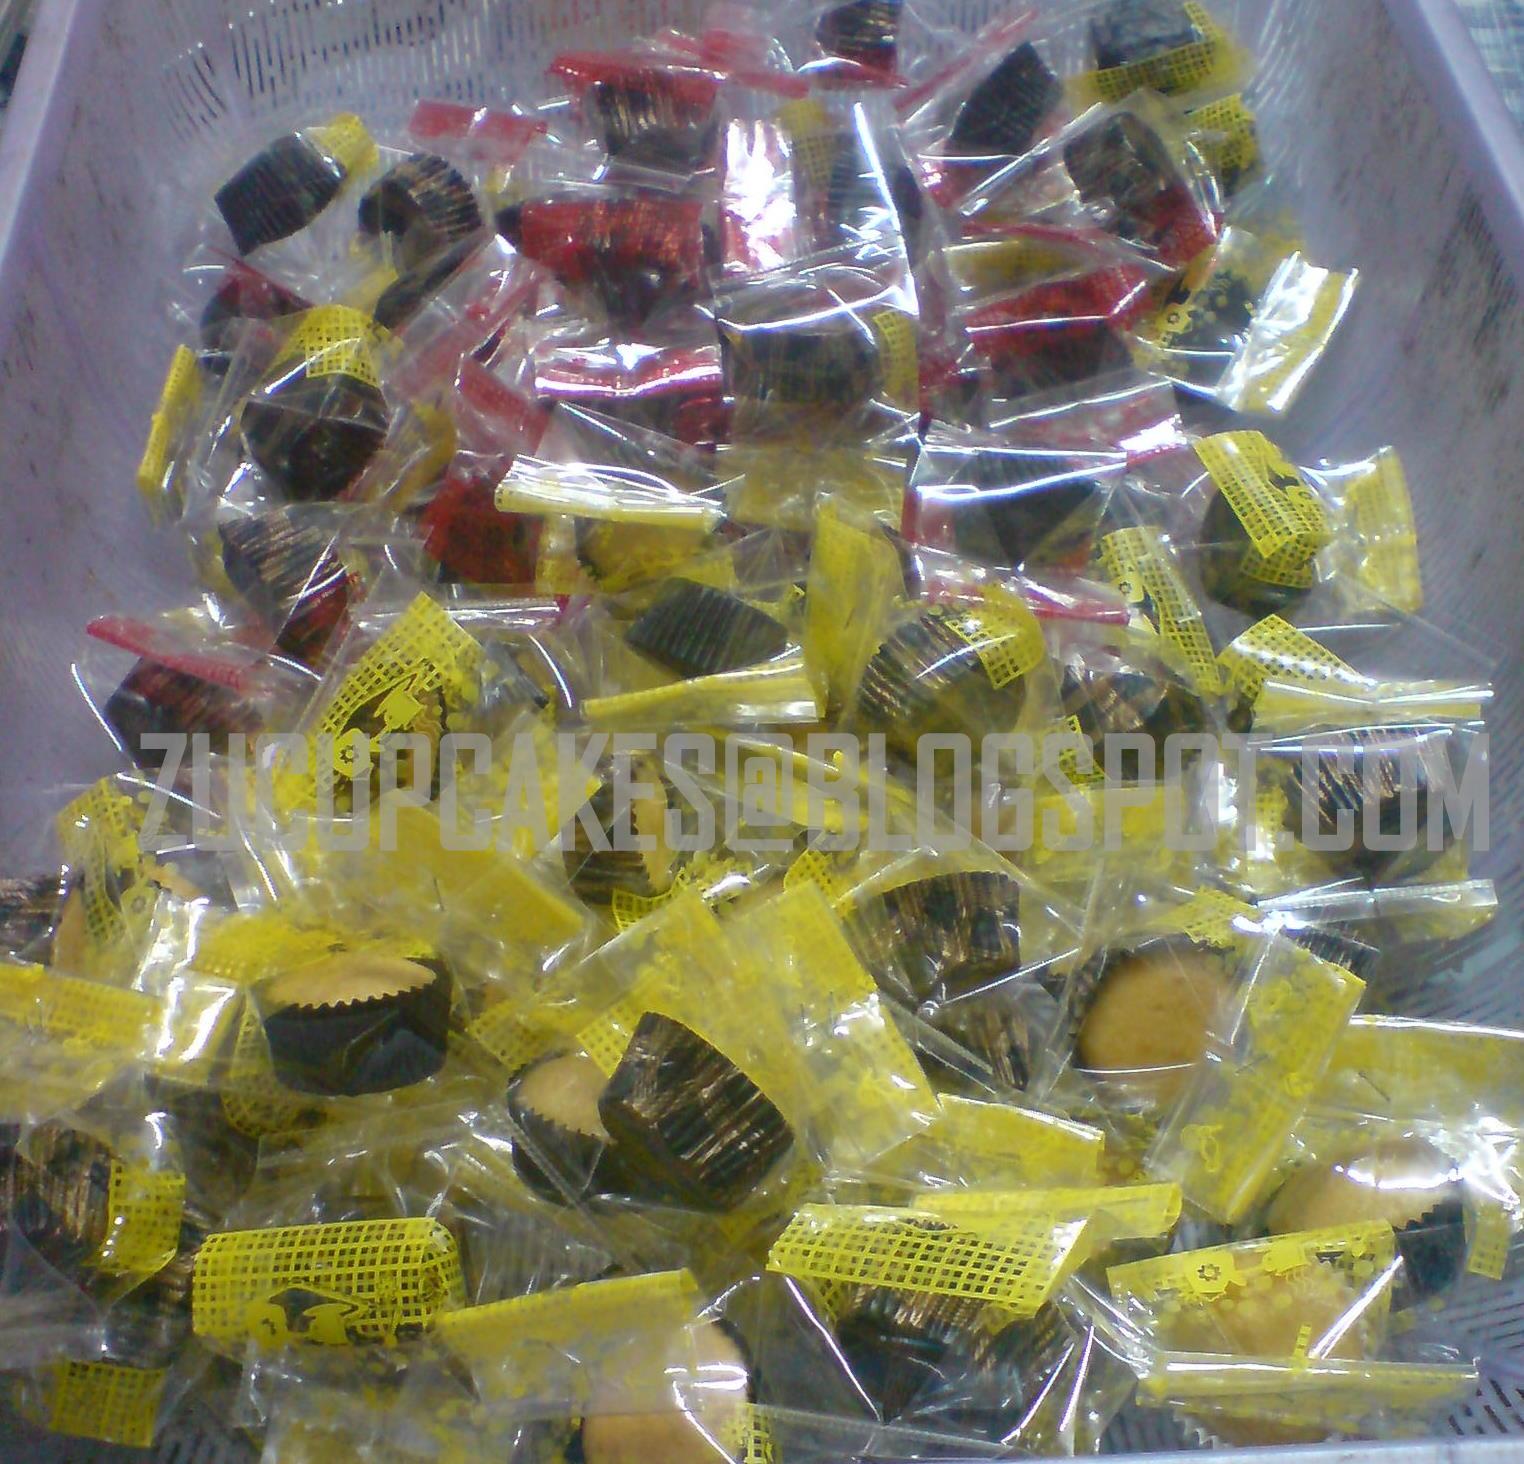 La dolce door gift majlis cukur jambul for Idea door gift cukur jambul